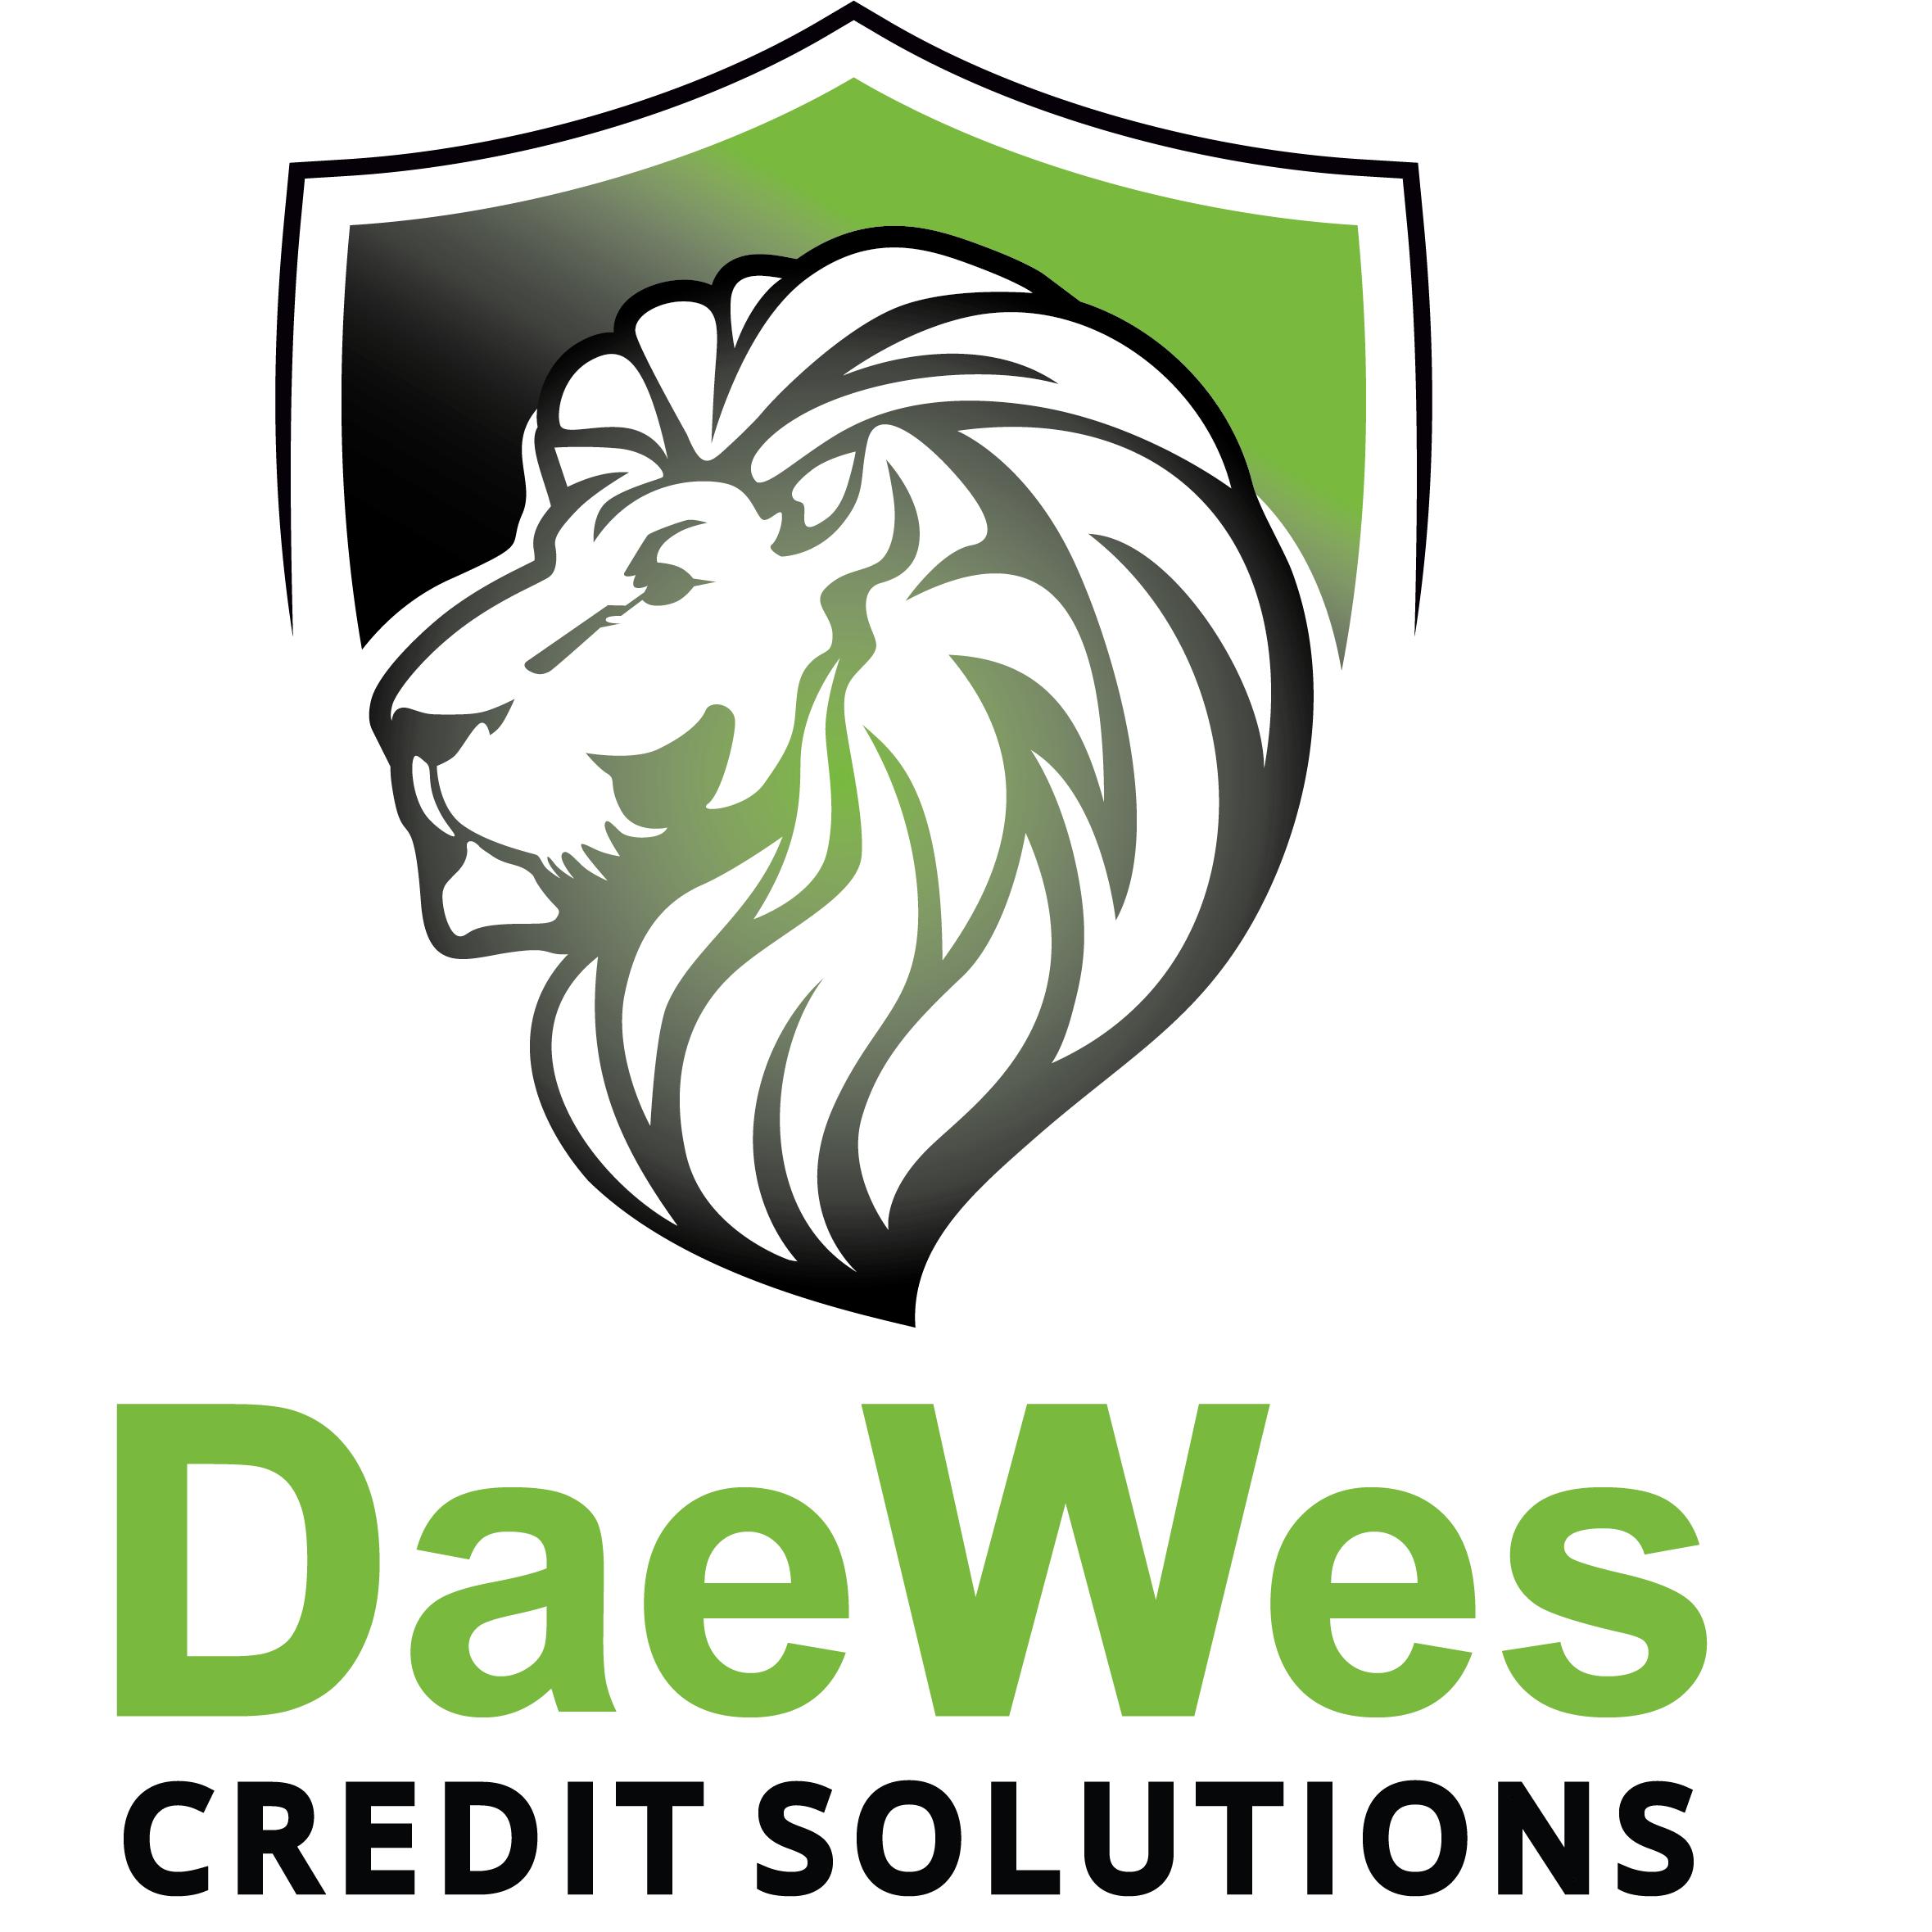 DaeWes Credit Solutions - Philadelphia, PA 19139 - (855)426-7745 | ShowMeLocal.com